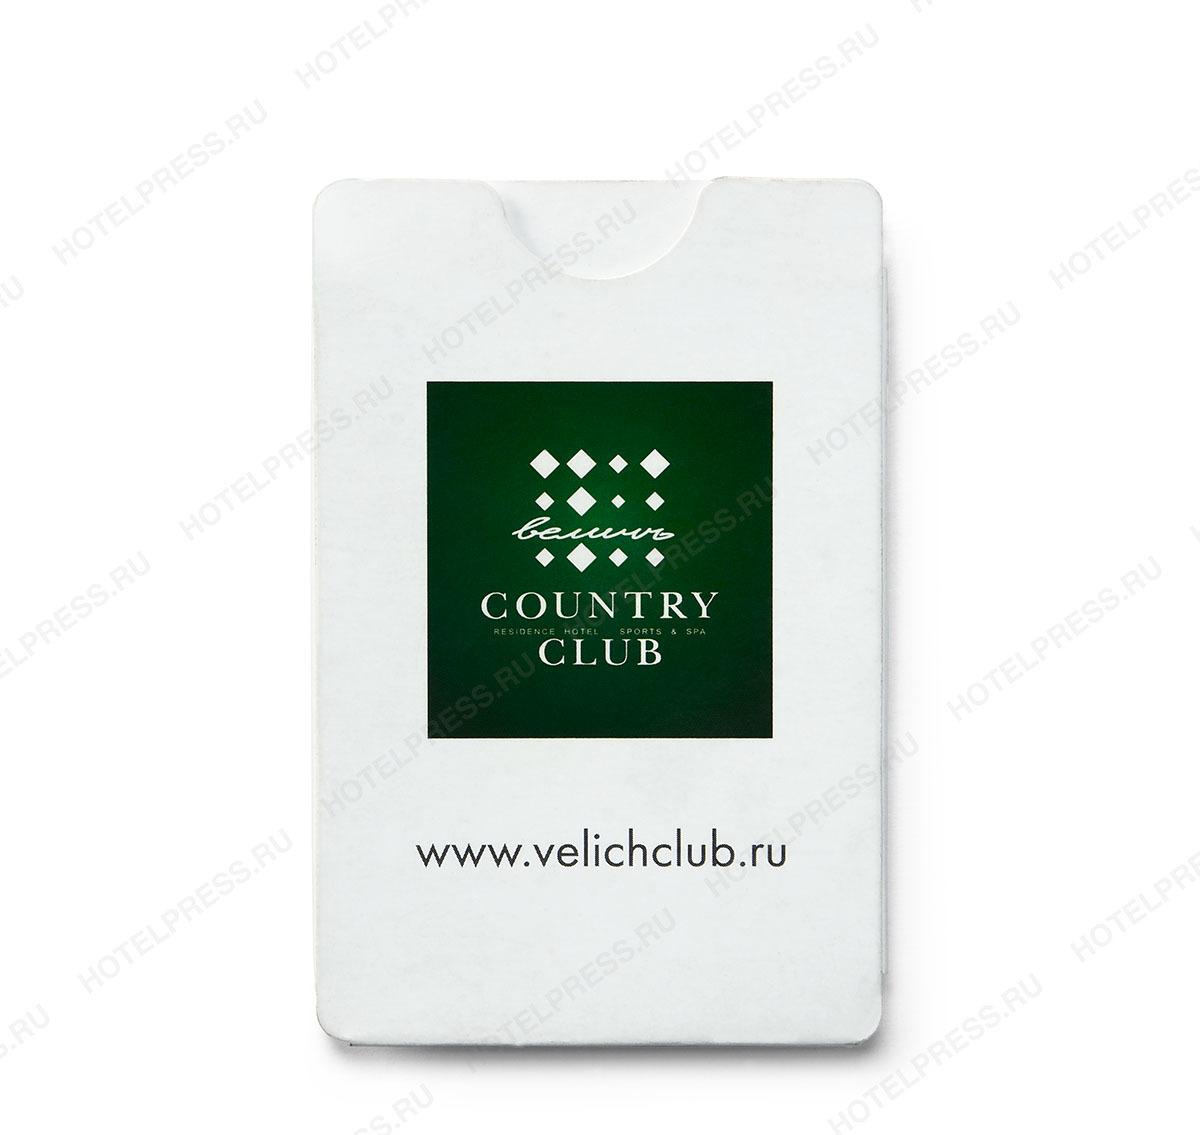 Кардхолдер с Z-картой отеля COUNTRY CLUB